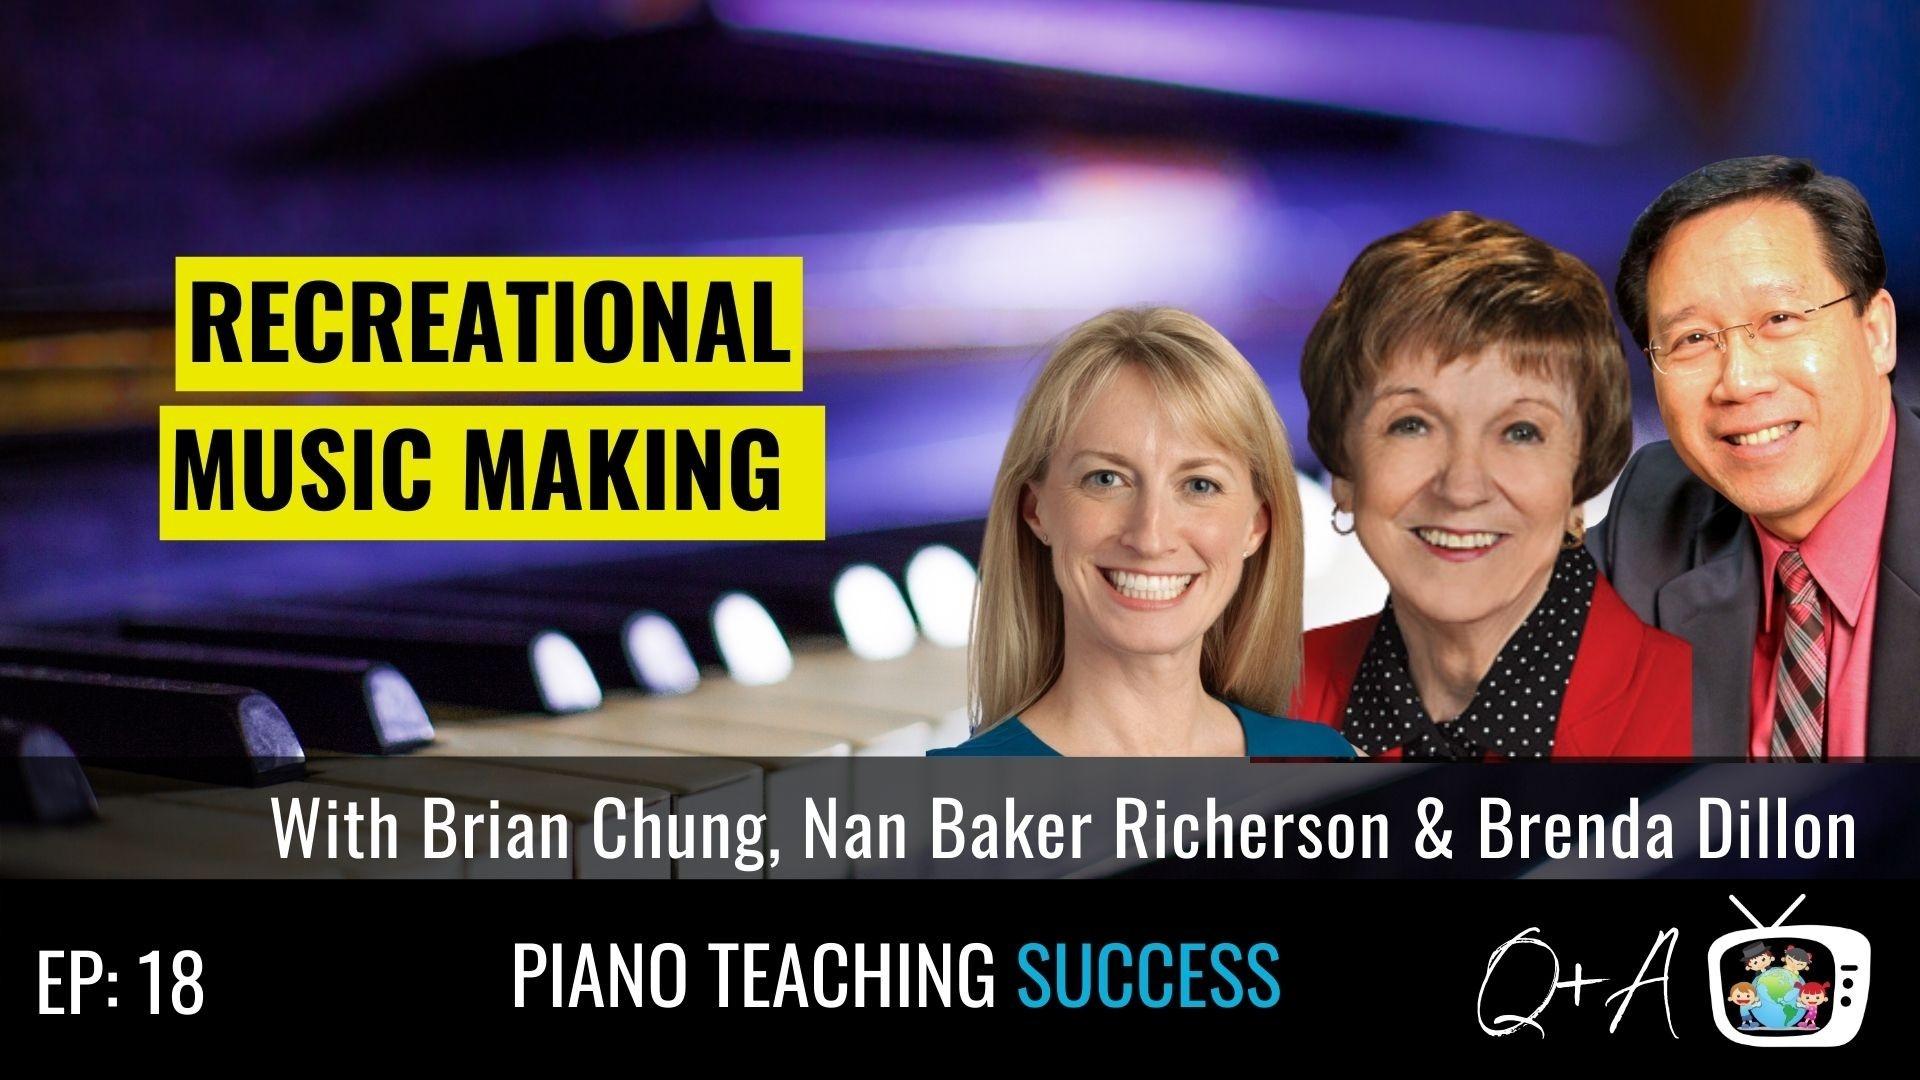 Brian Chung, Nan Baker Richerson, Brenda Dillon